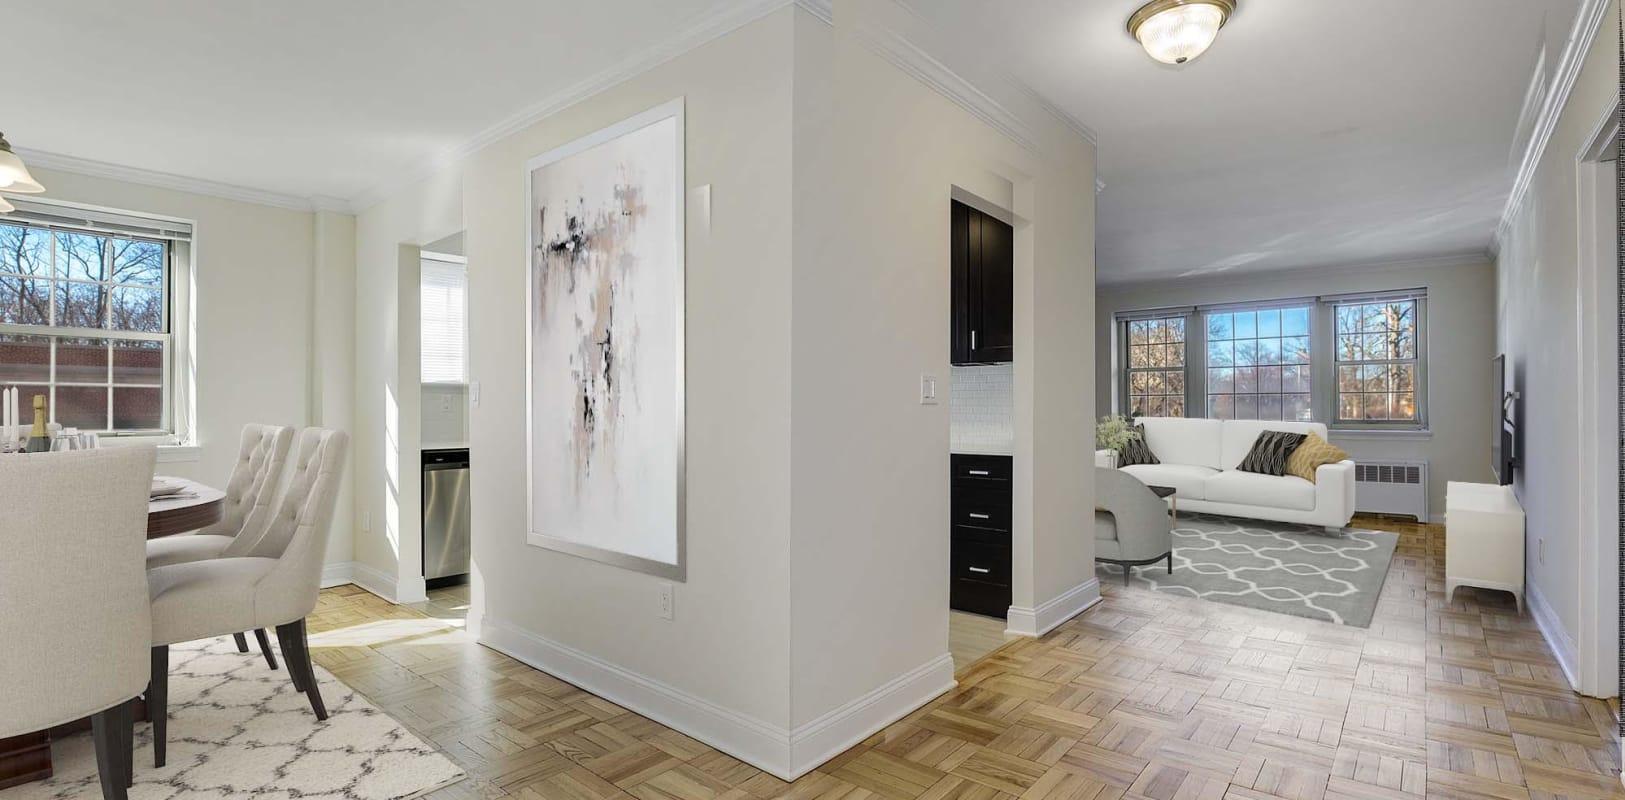 Sleek, modern apartment at Blair House in Morristown, New Jersey